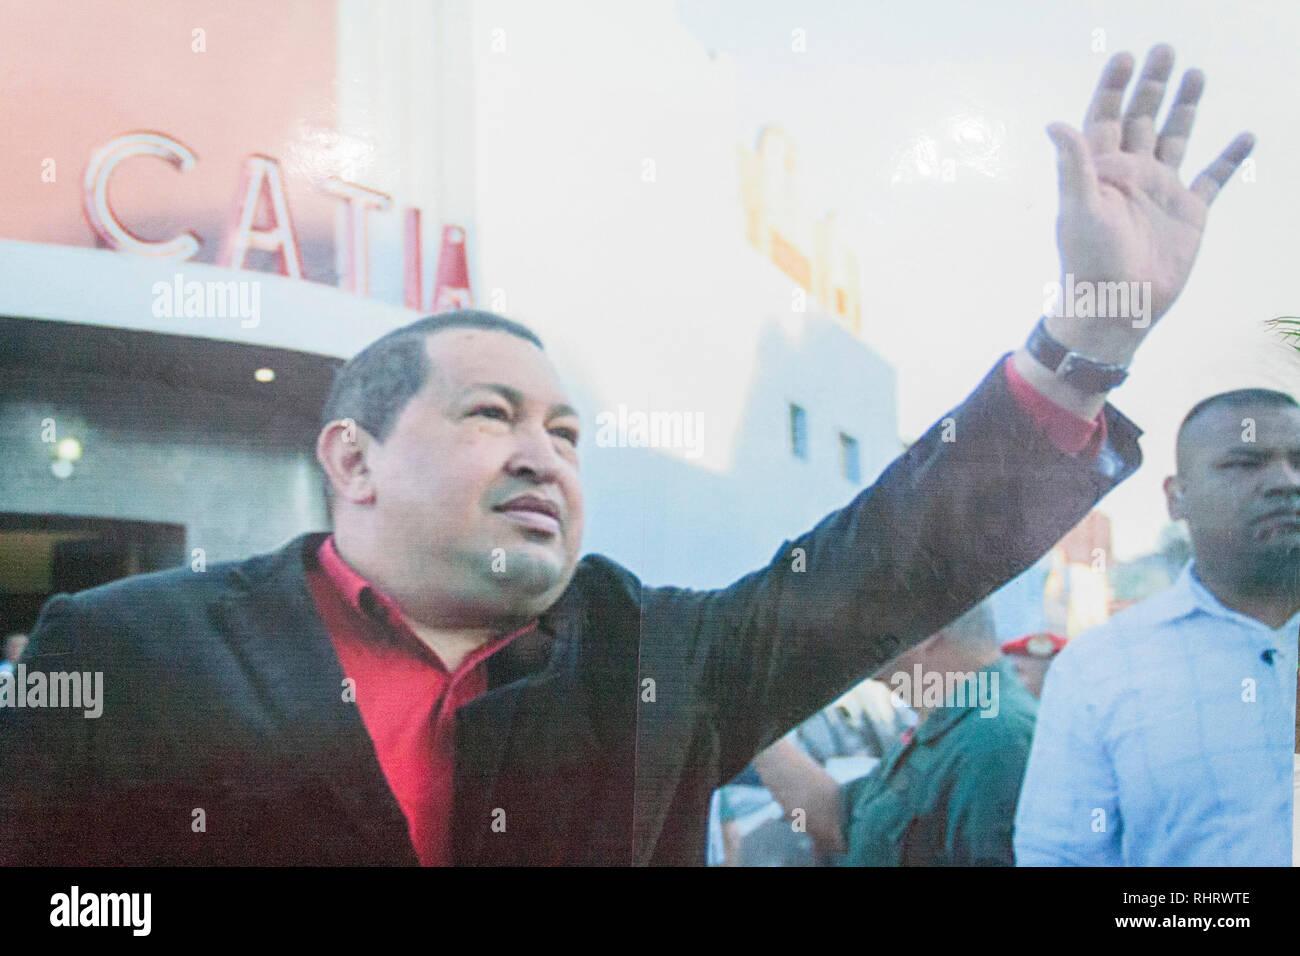 Caracas, Dtto Capital / Venezuela - 03/05/2013. Hugo Chávez poster in Catia Theater in Catia neighborhood. - Stock Image